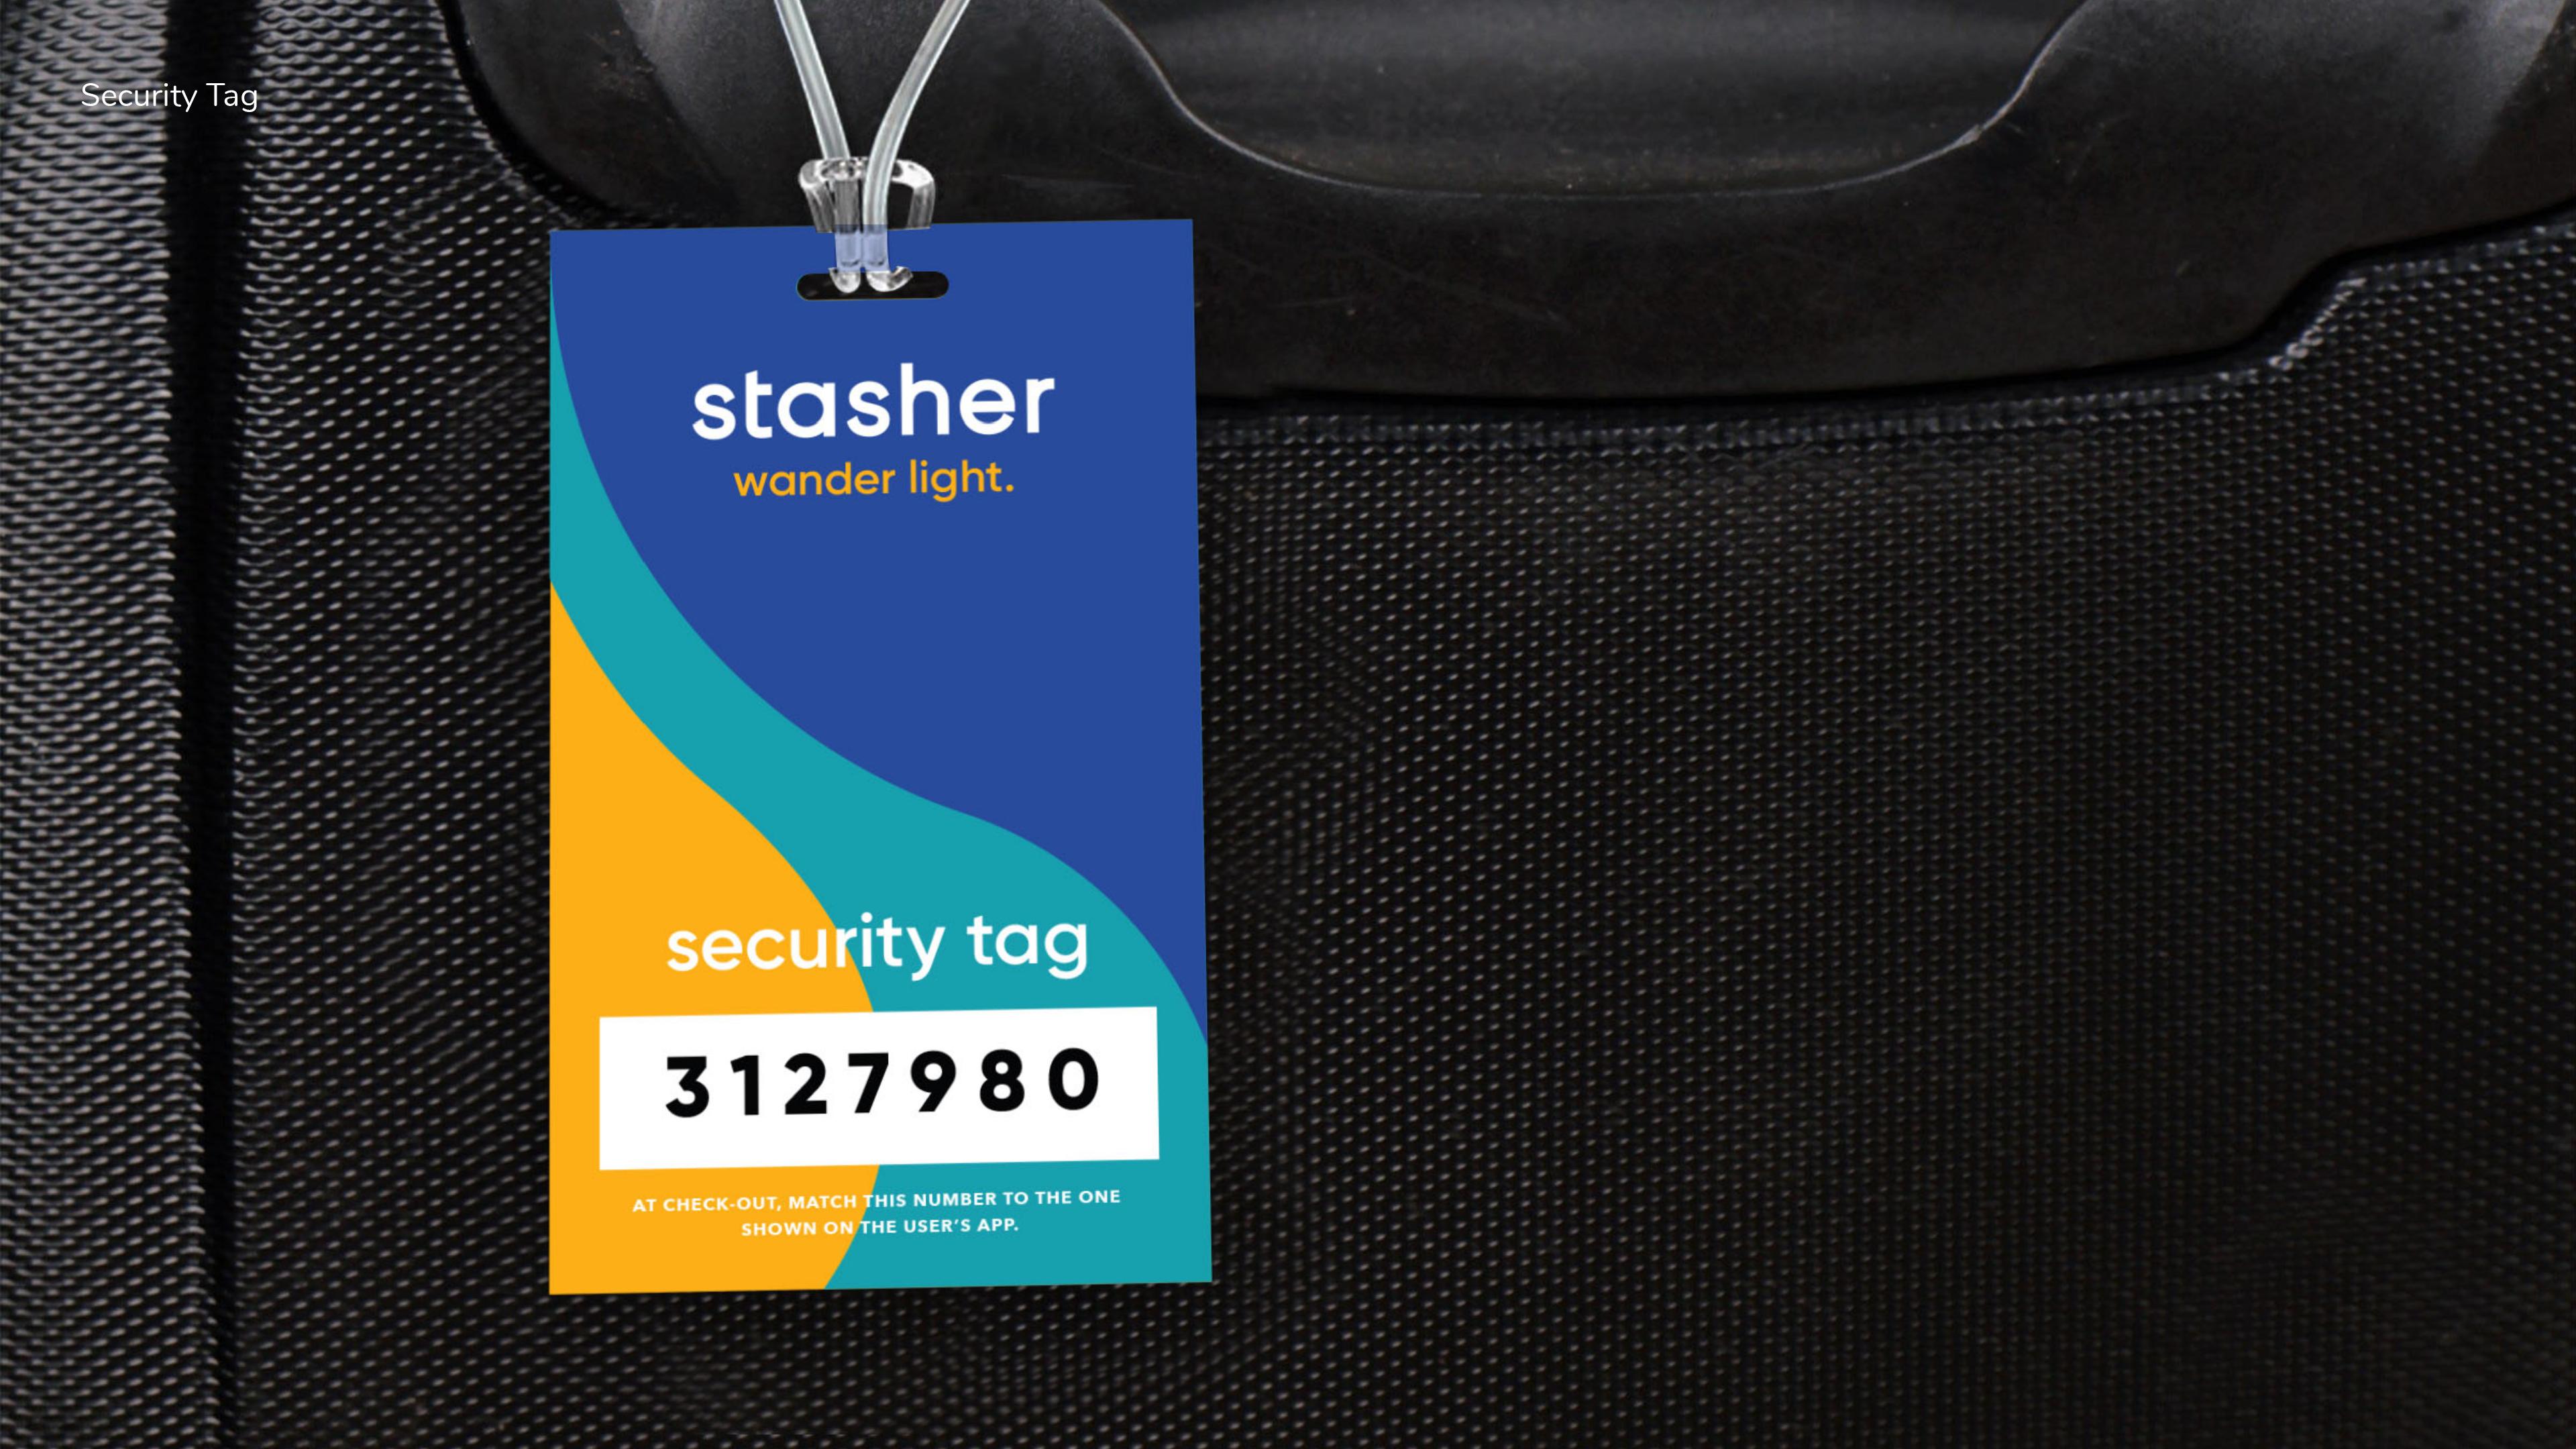 stasher_security_tag_2.0Artboard-1-copy-8@2x